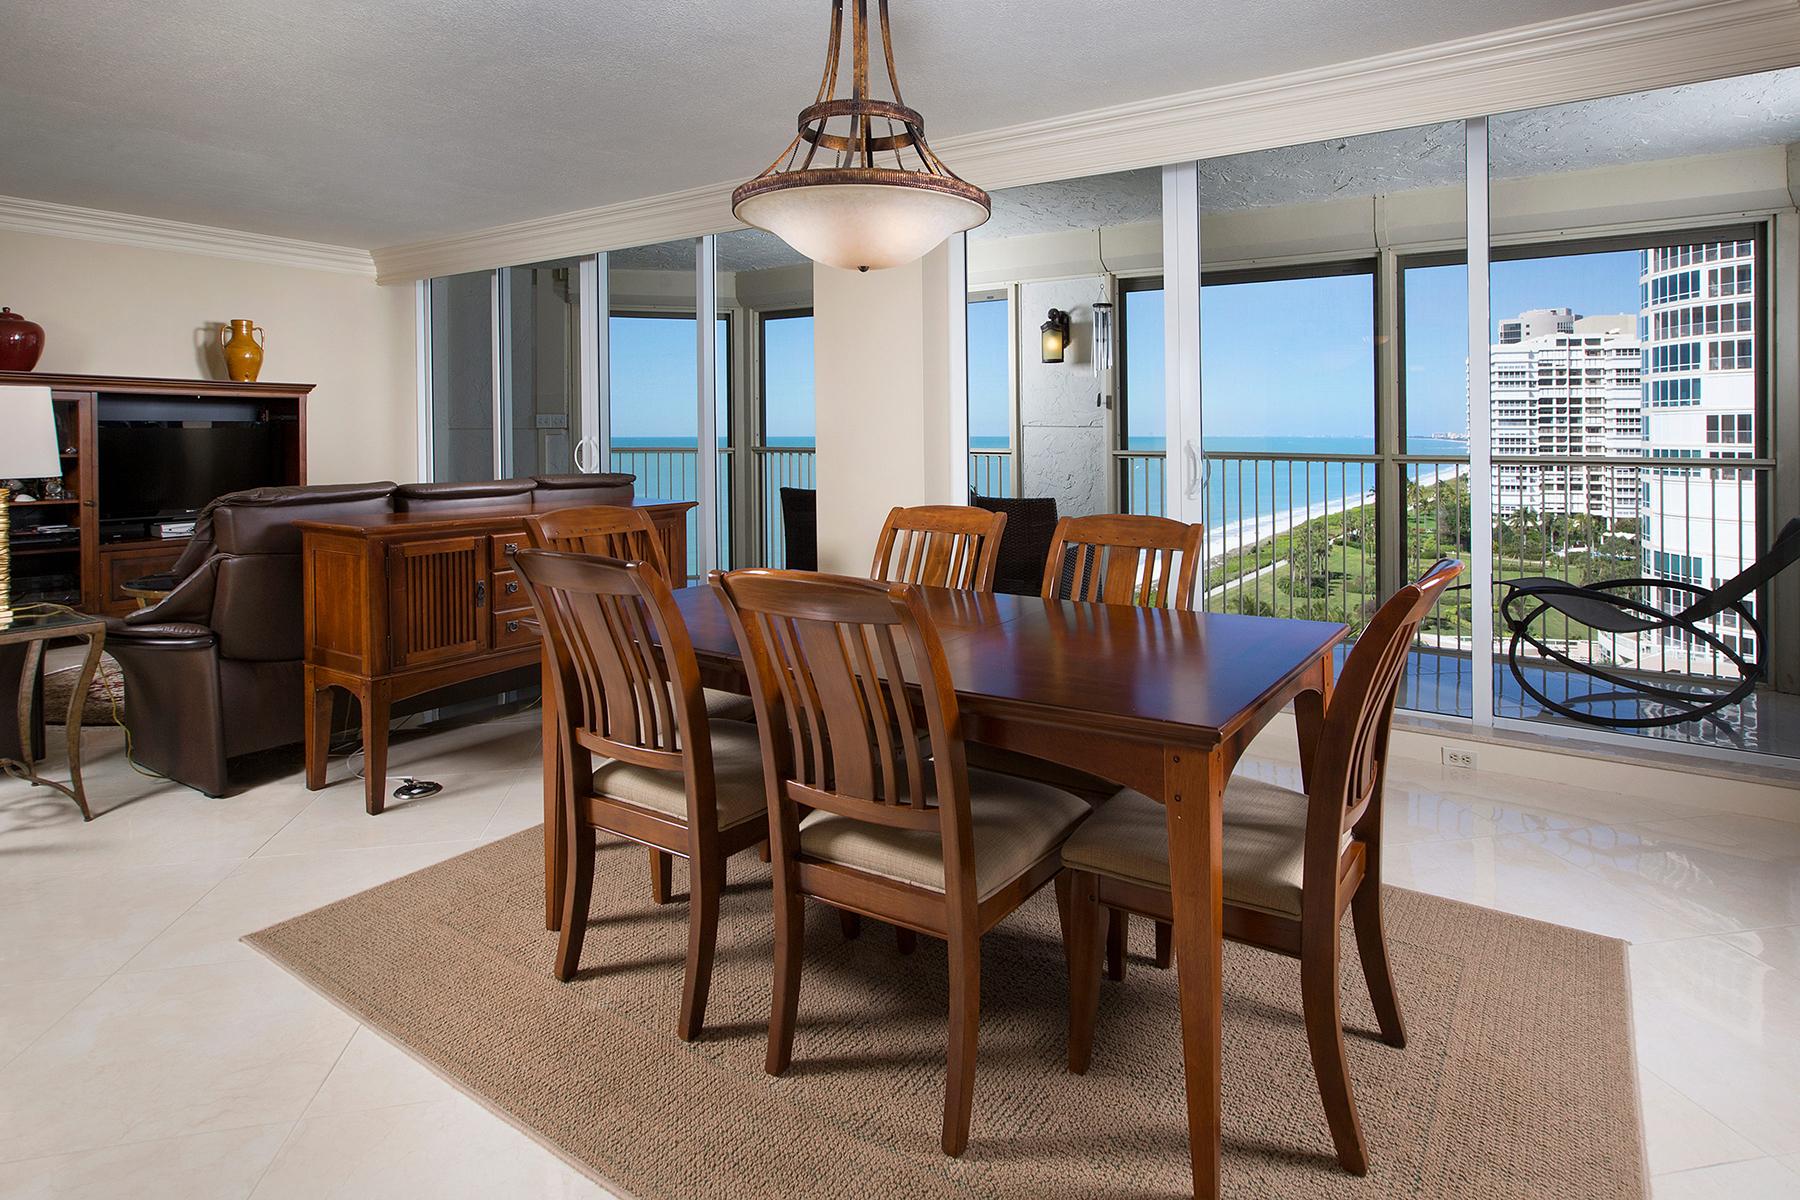 共管物業 為 出售 在 Park Shore - La Mer 4051 Gulf Shore Blvd N 1200 Naples, 佛羅里達州, 34103 美國